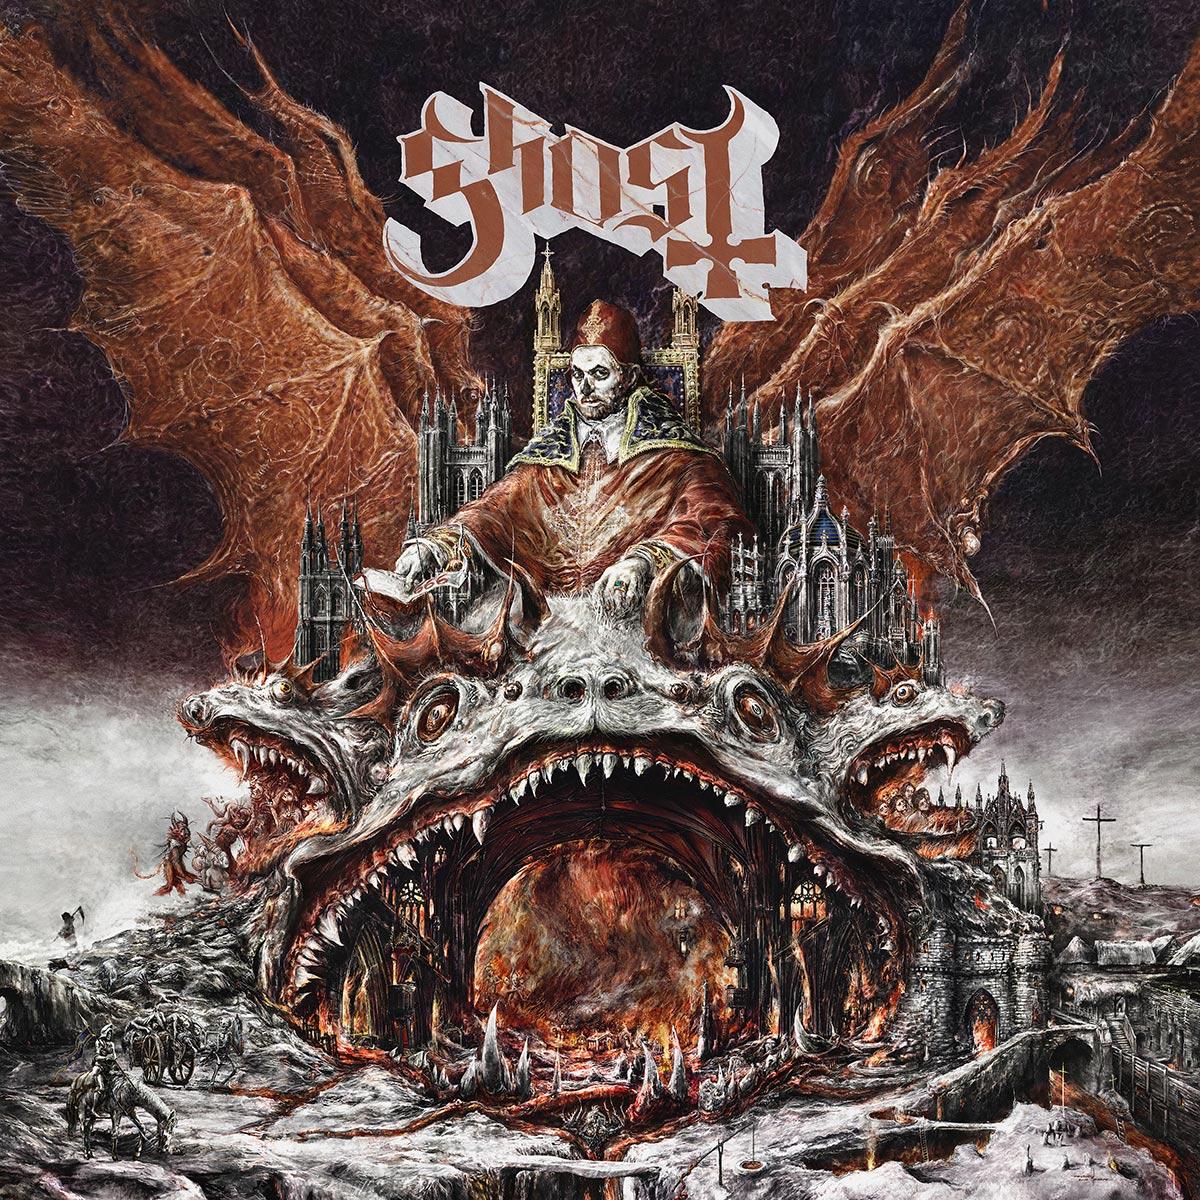 ghost prequelle new album Ghost return with new album, Prequelle: Stream